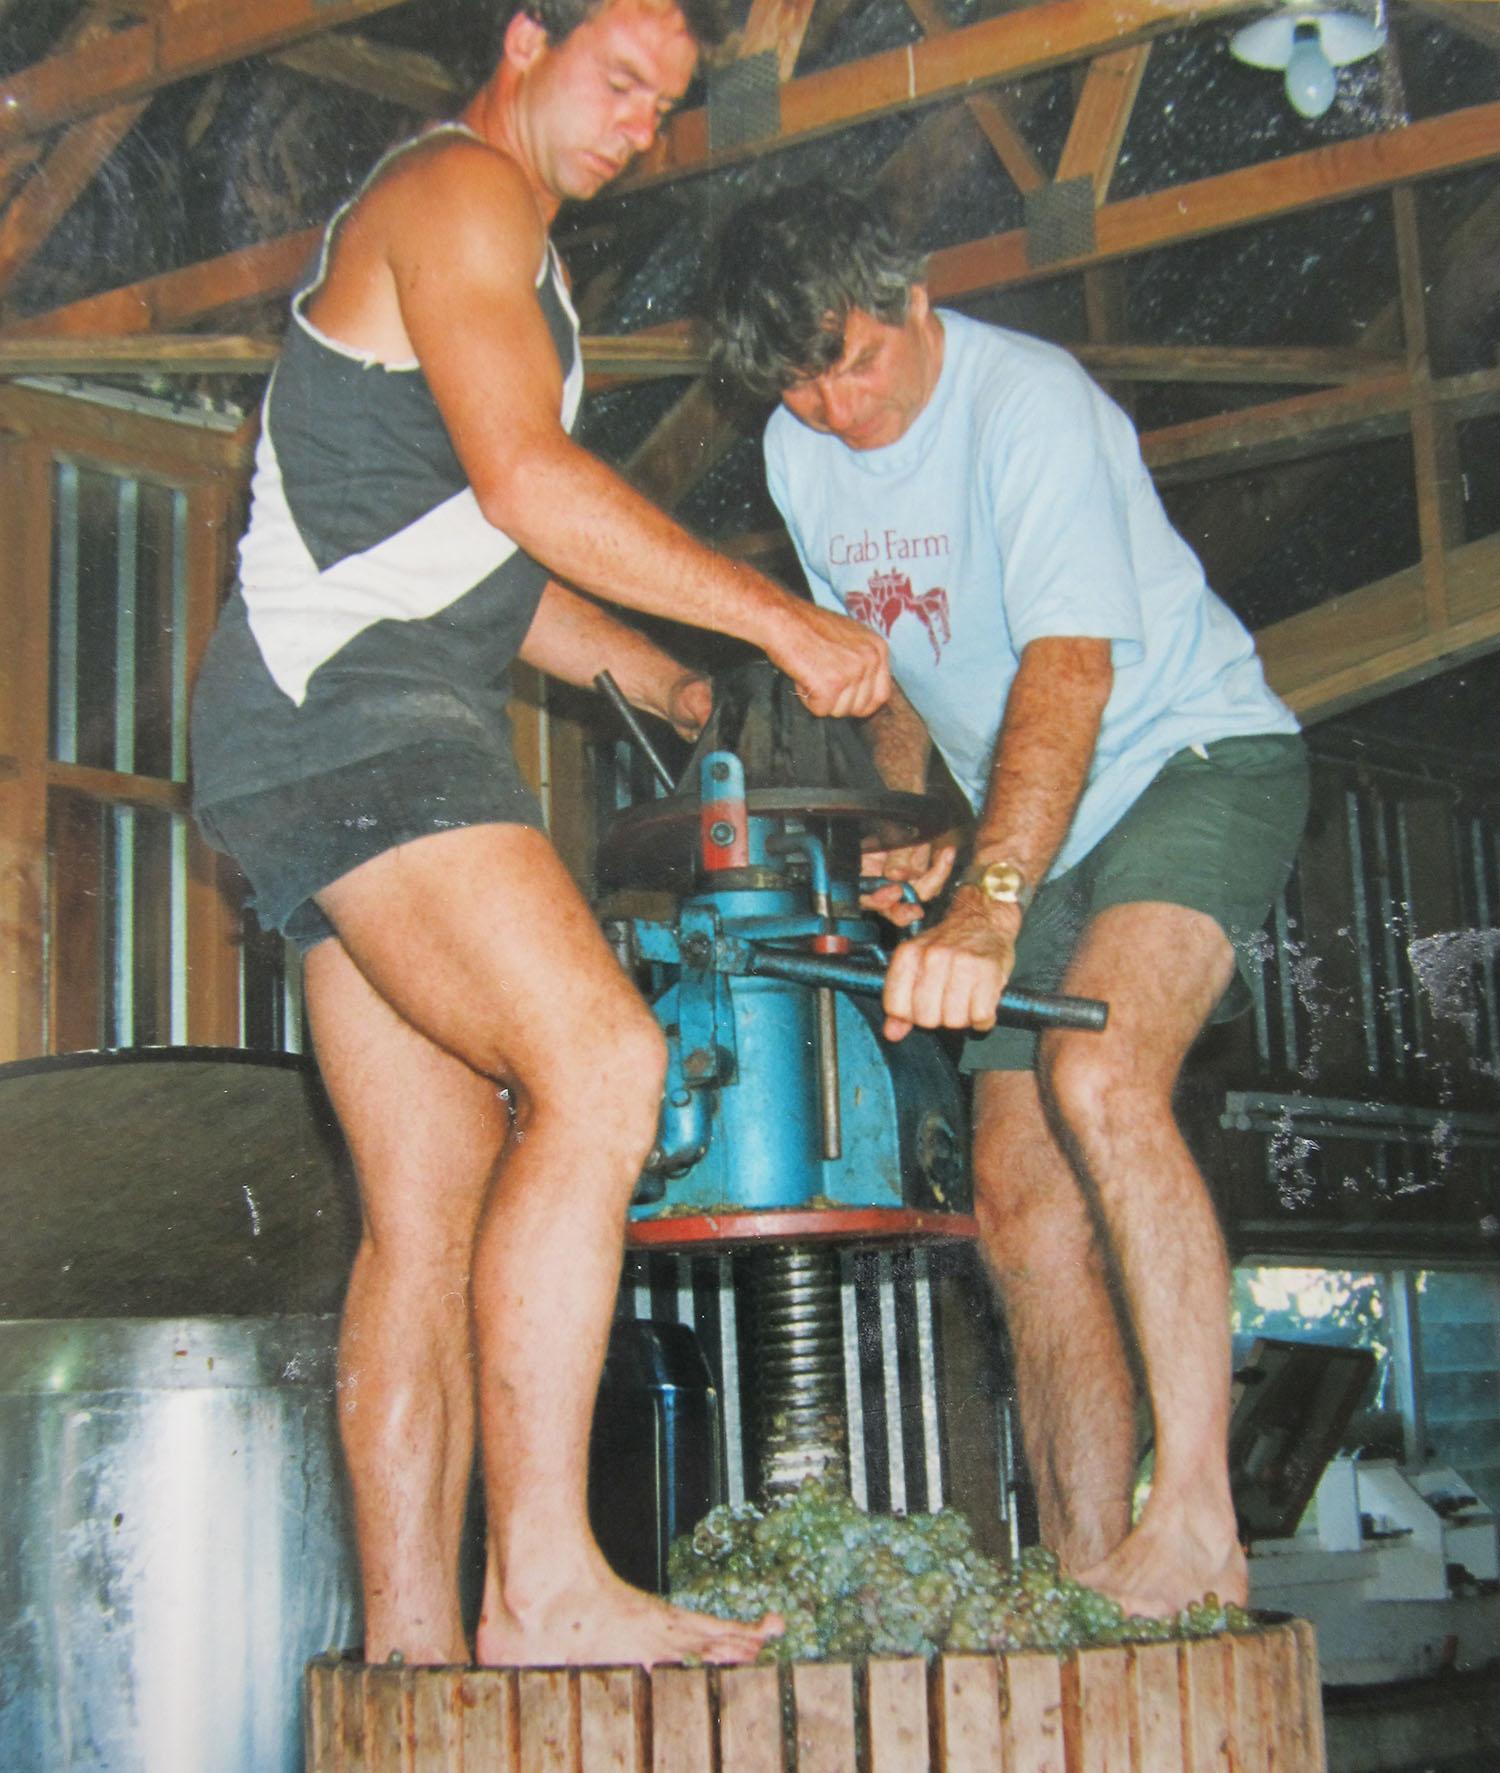 crab-farm-winery-winemaking.jpg